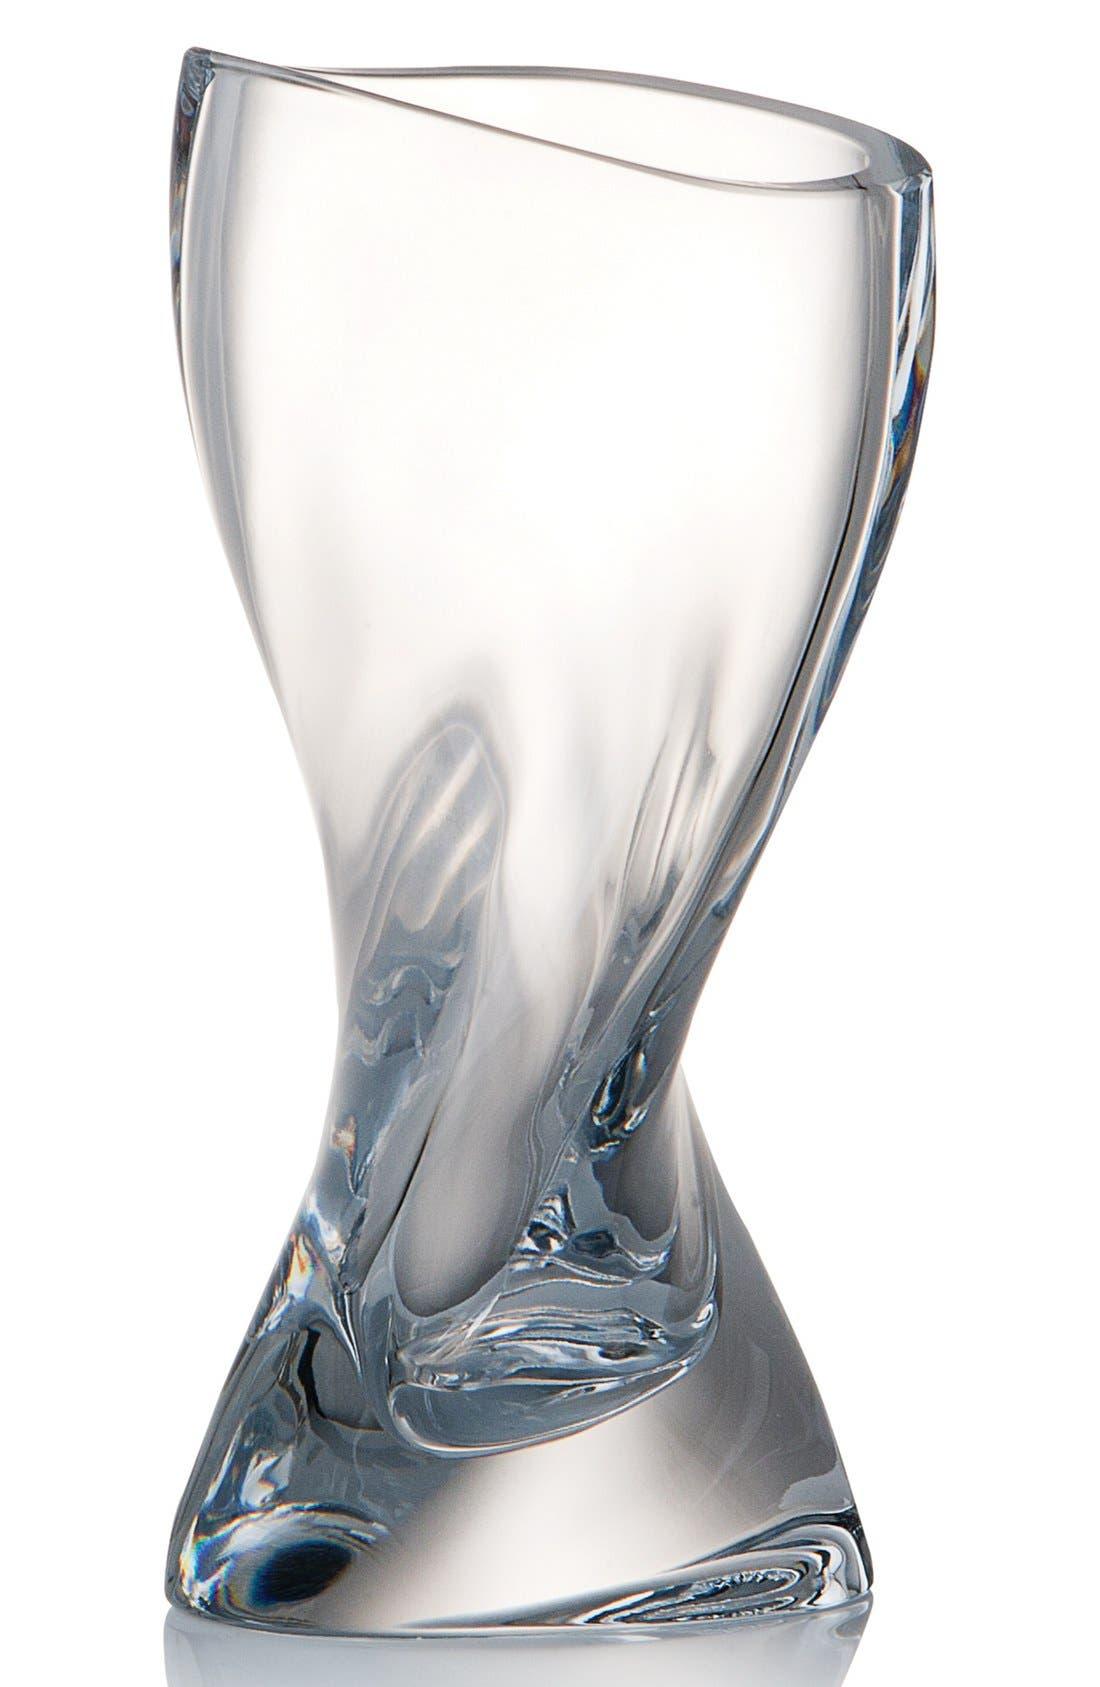 Main Image - Nambé 'River' Vase, Small